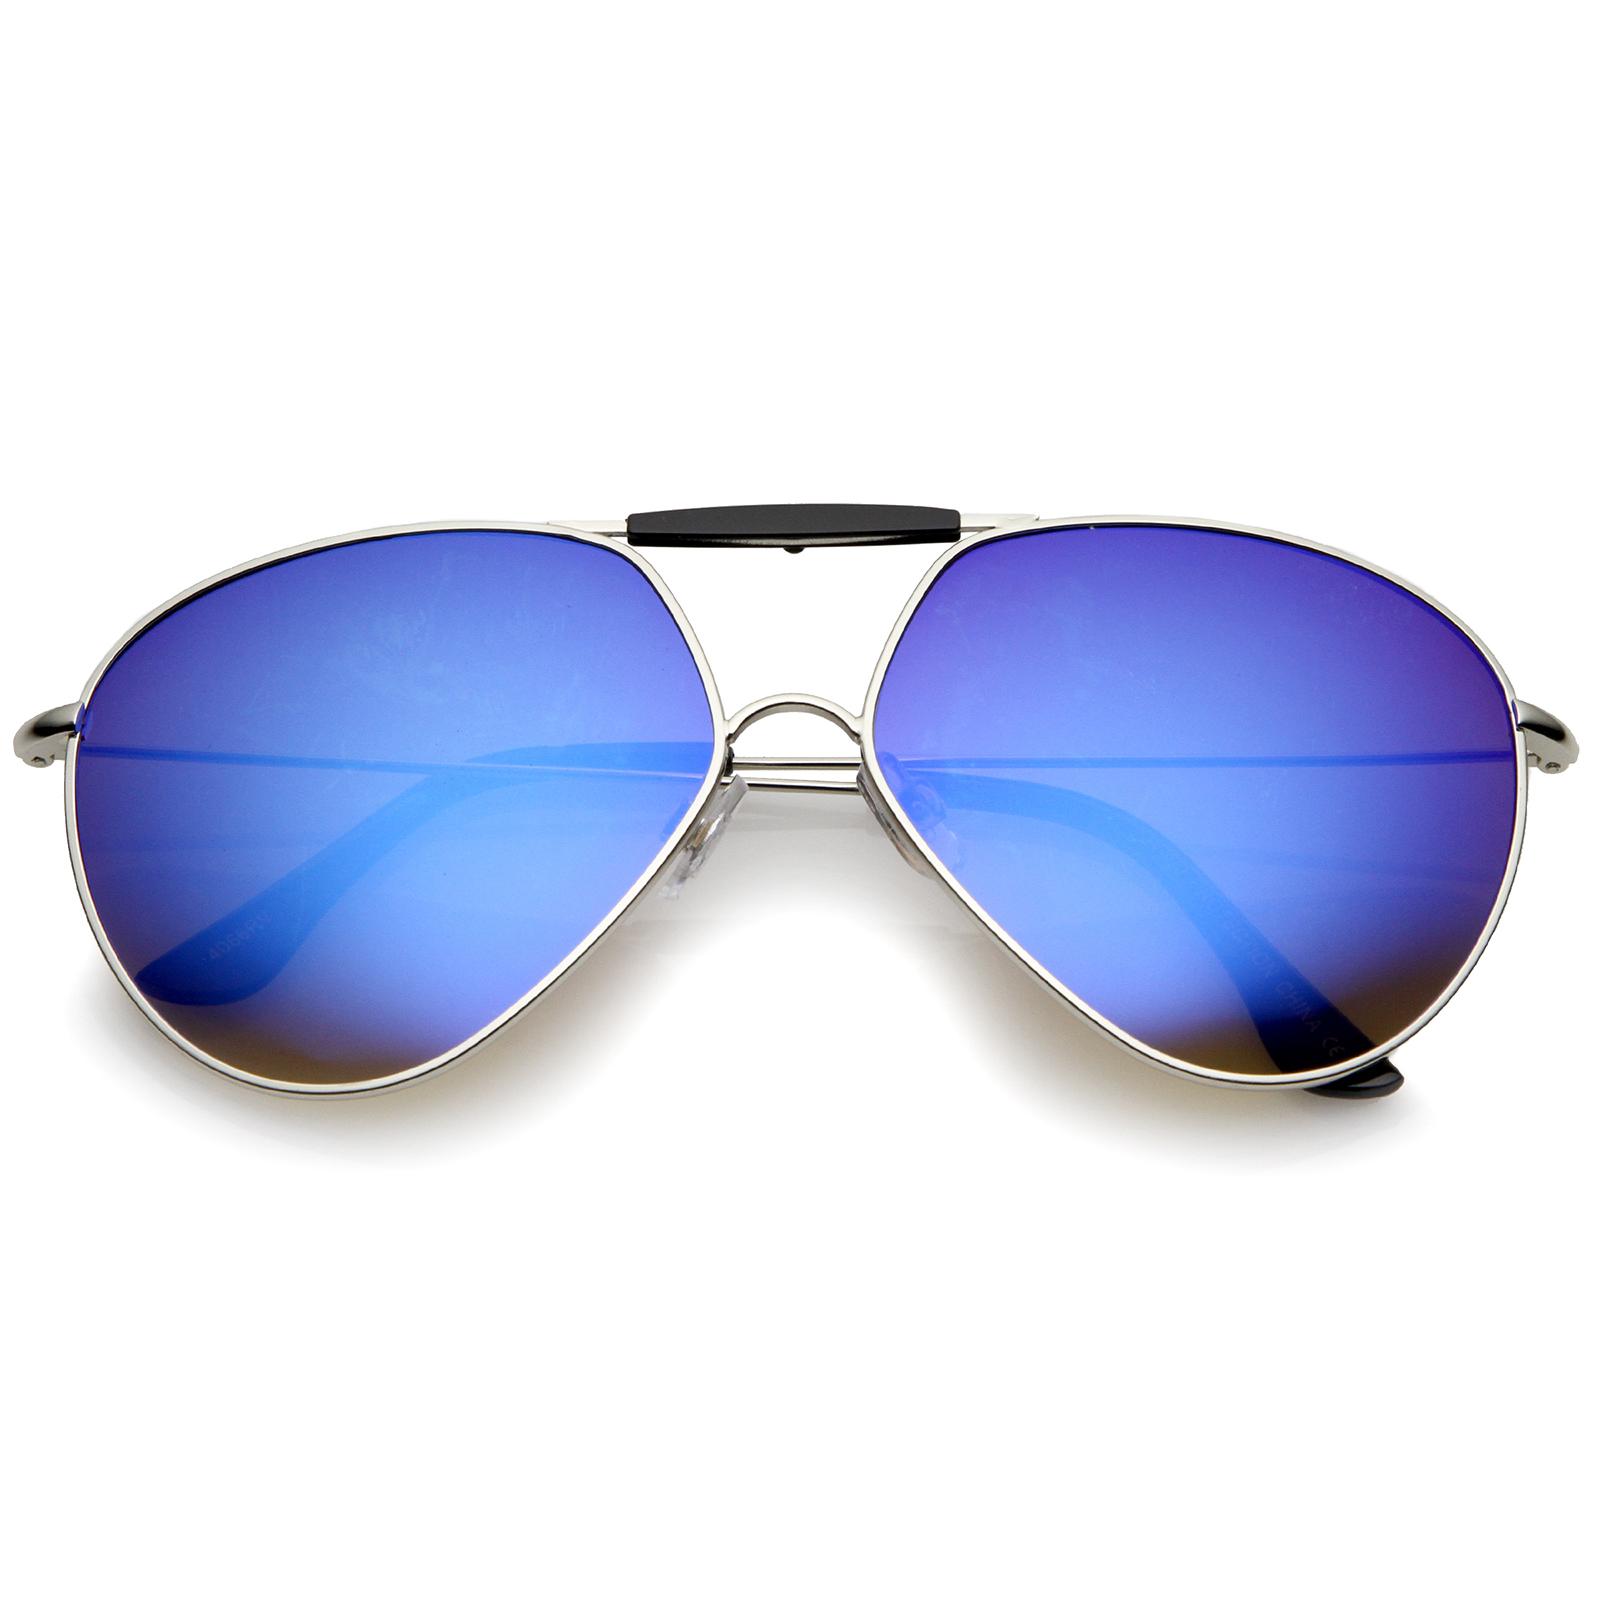 cd48fe55998 Selima Optique Money 2 Aviator Sunglasses Ebay